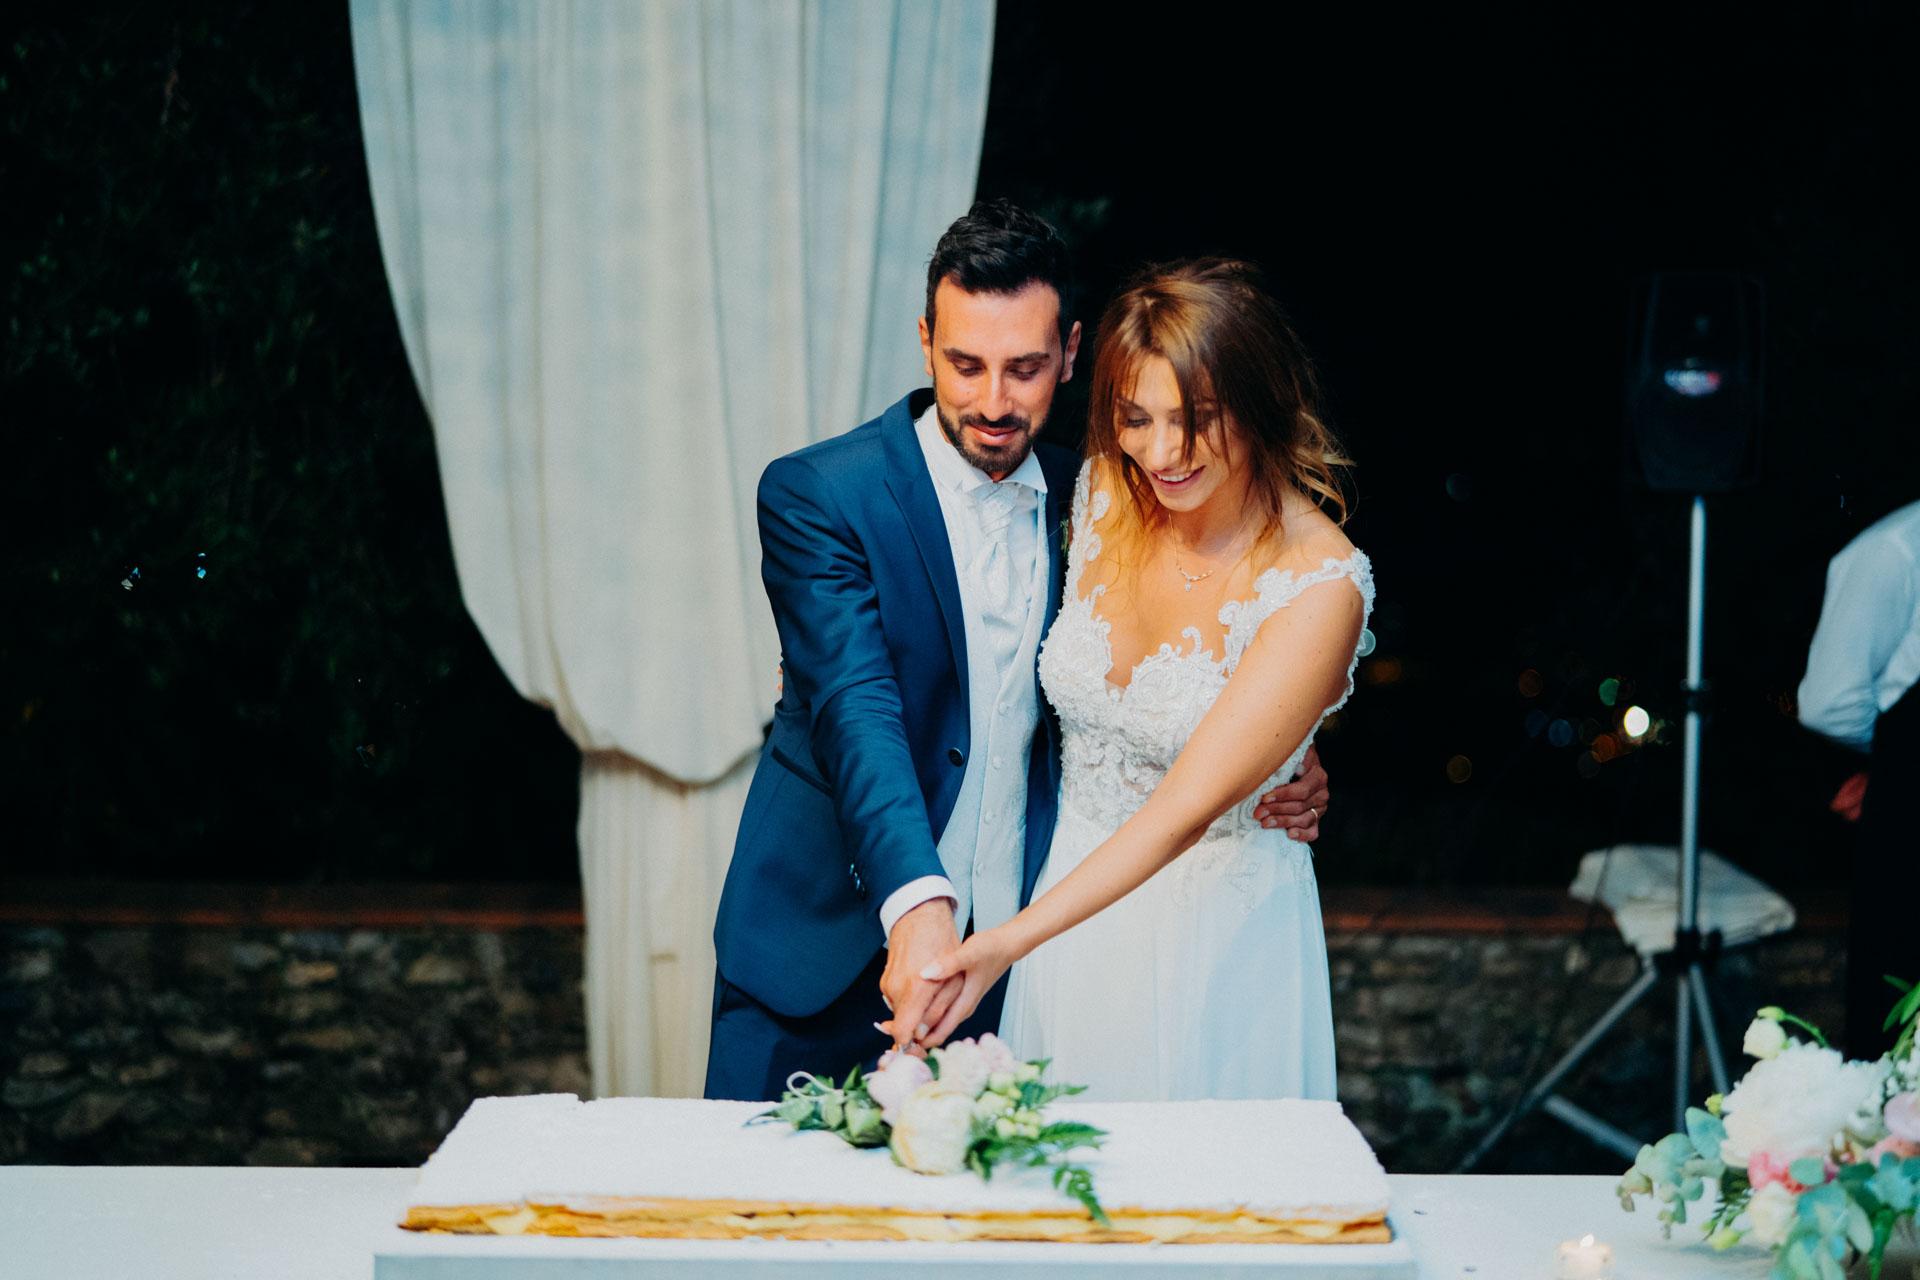 fotografo_matrimonio_toscana_poggio_tondo_111